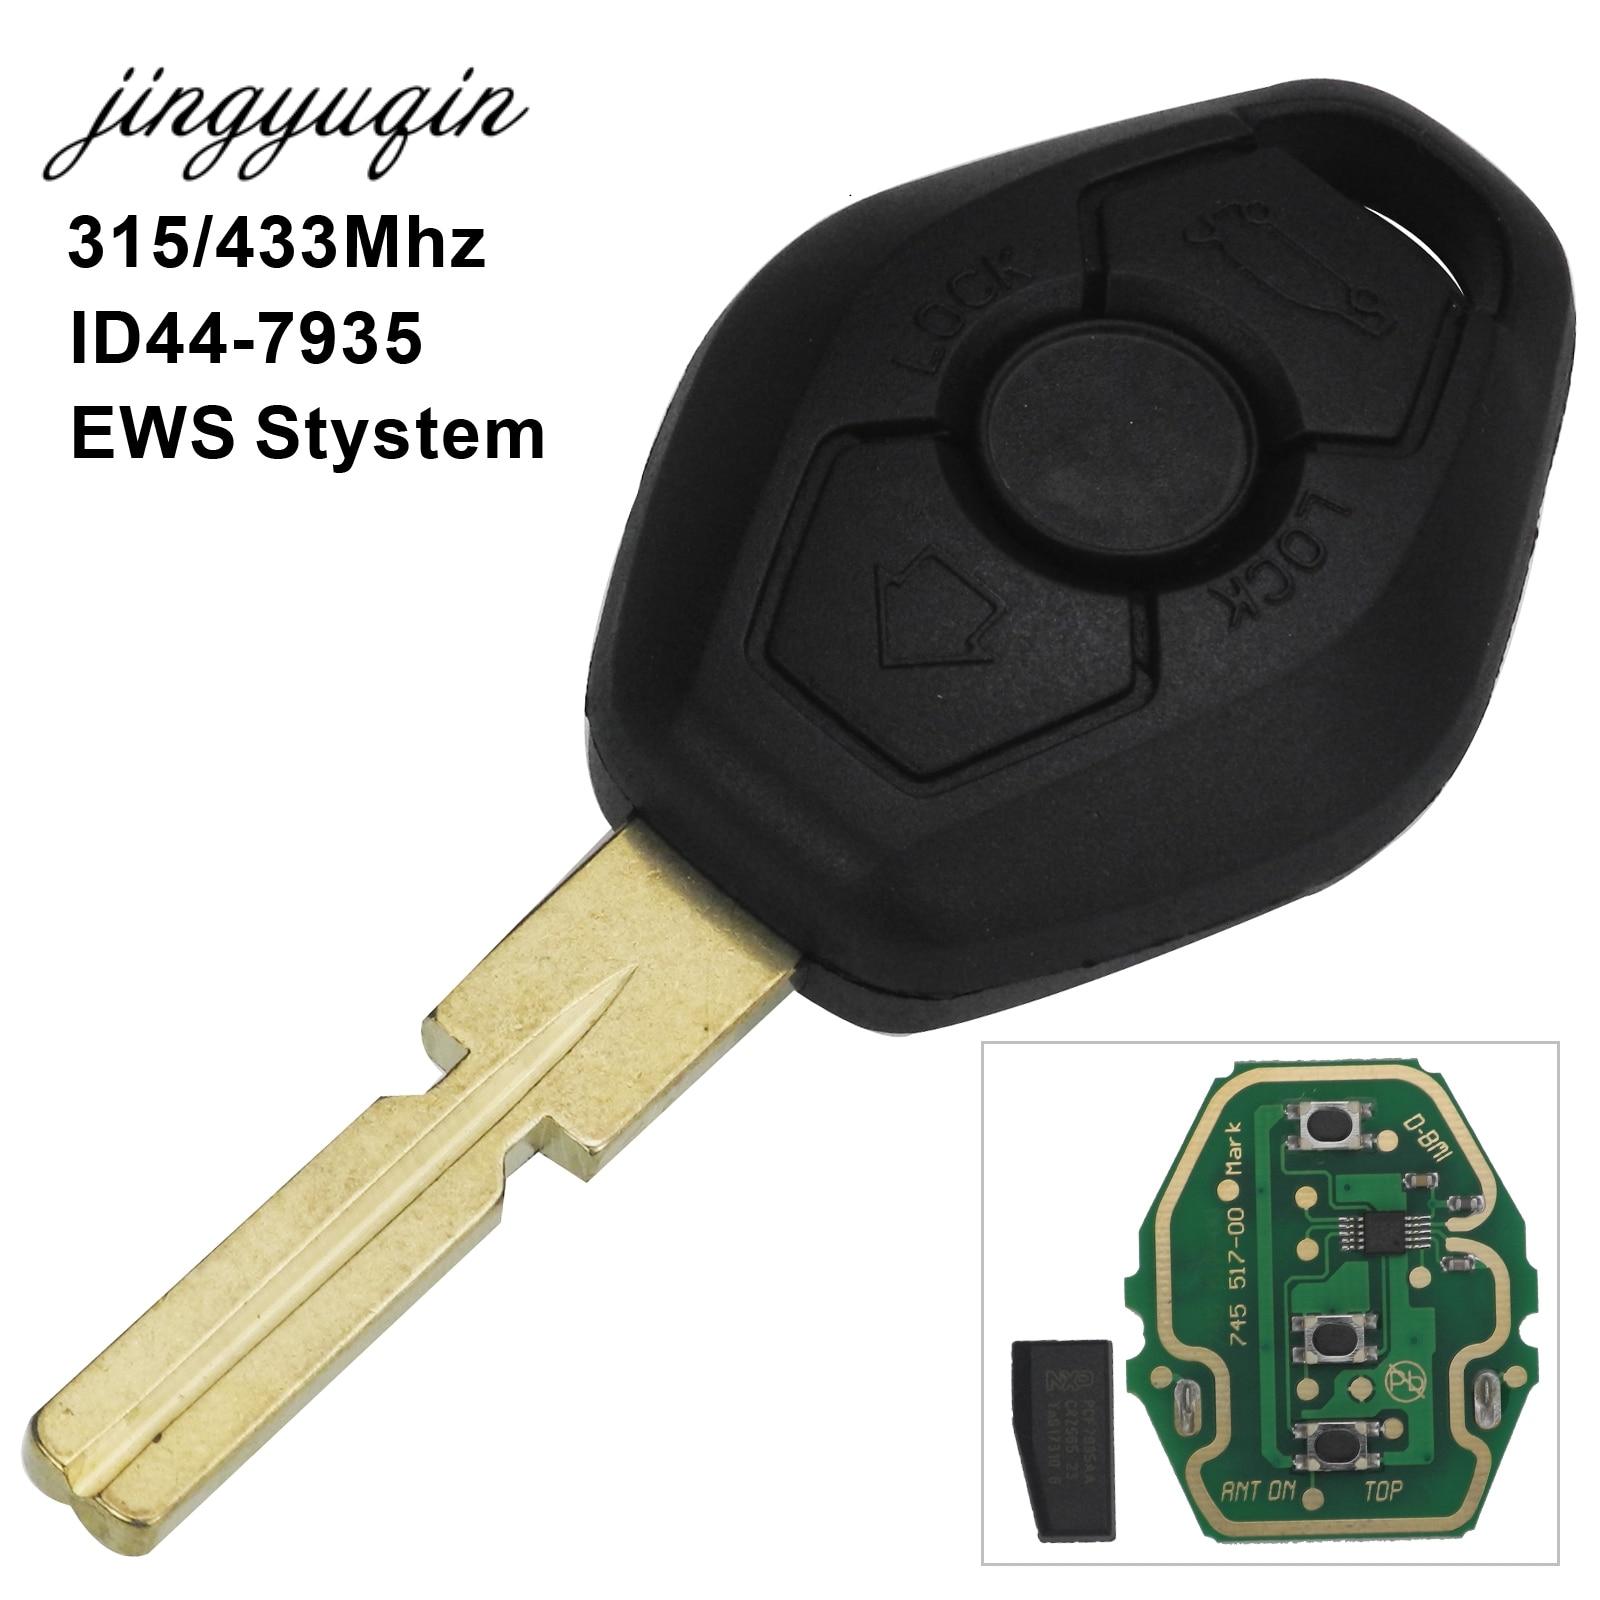 jingyuqin Remote Control Key 3 Button 315MHZ/433MHz ID44- Chip HU58 For BMW 3 5 7 Series E38 E39 E46 цена и фото